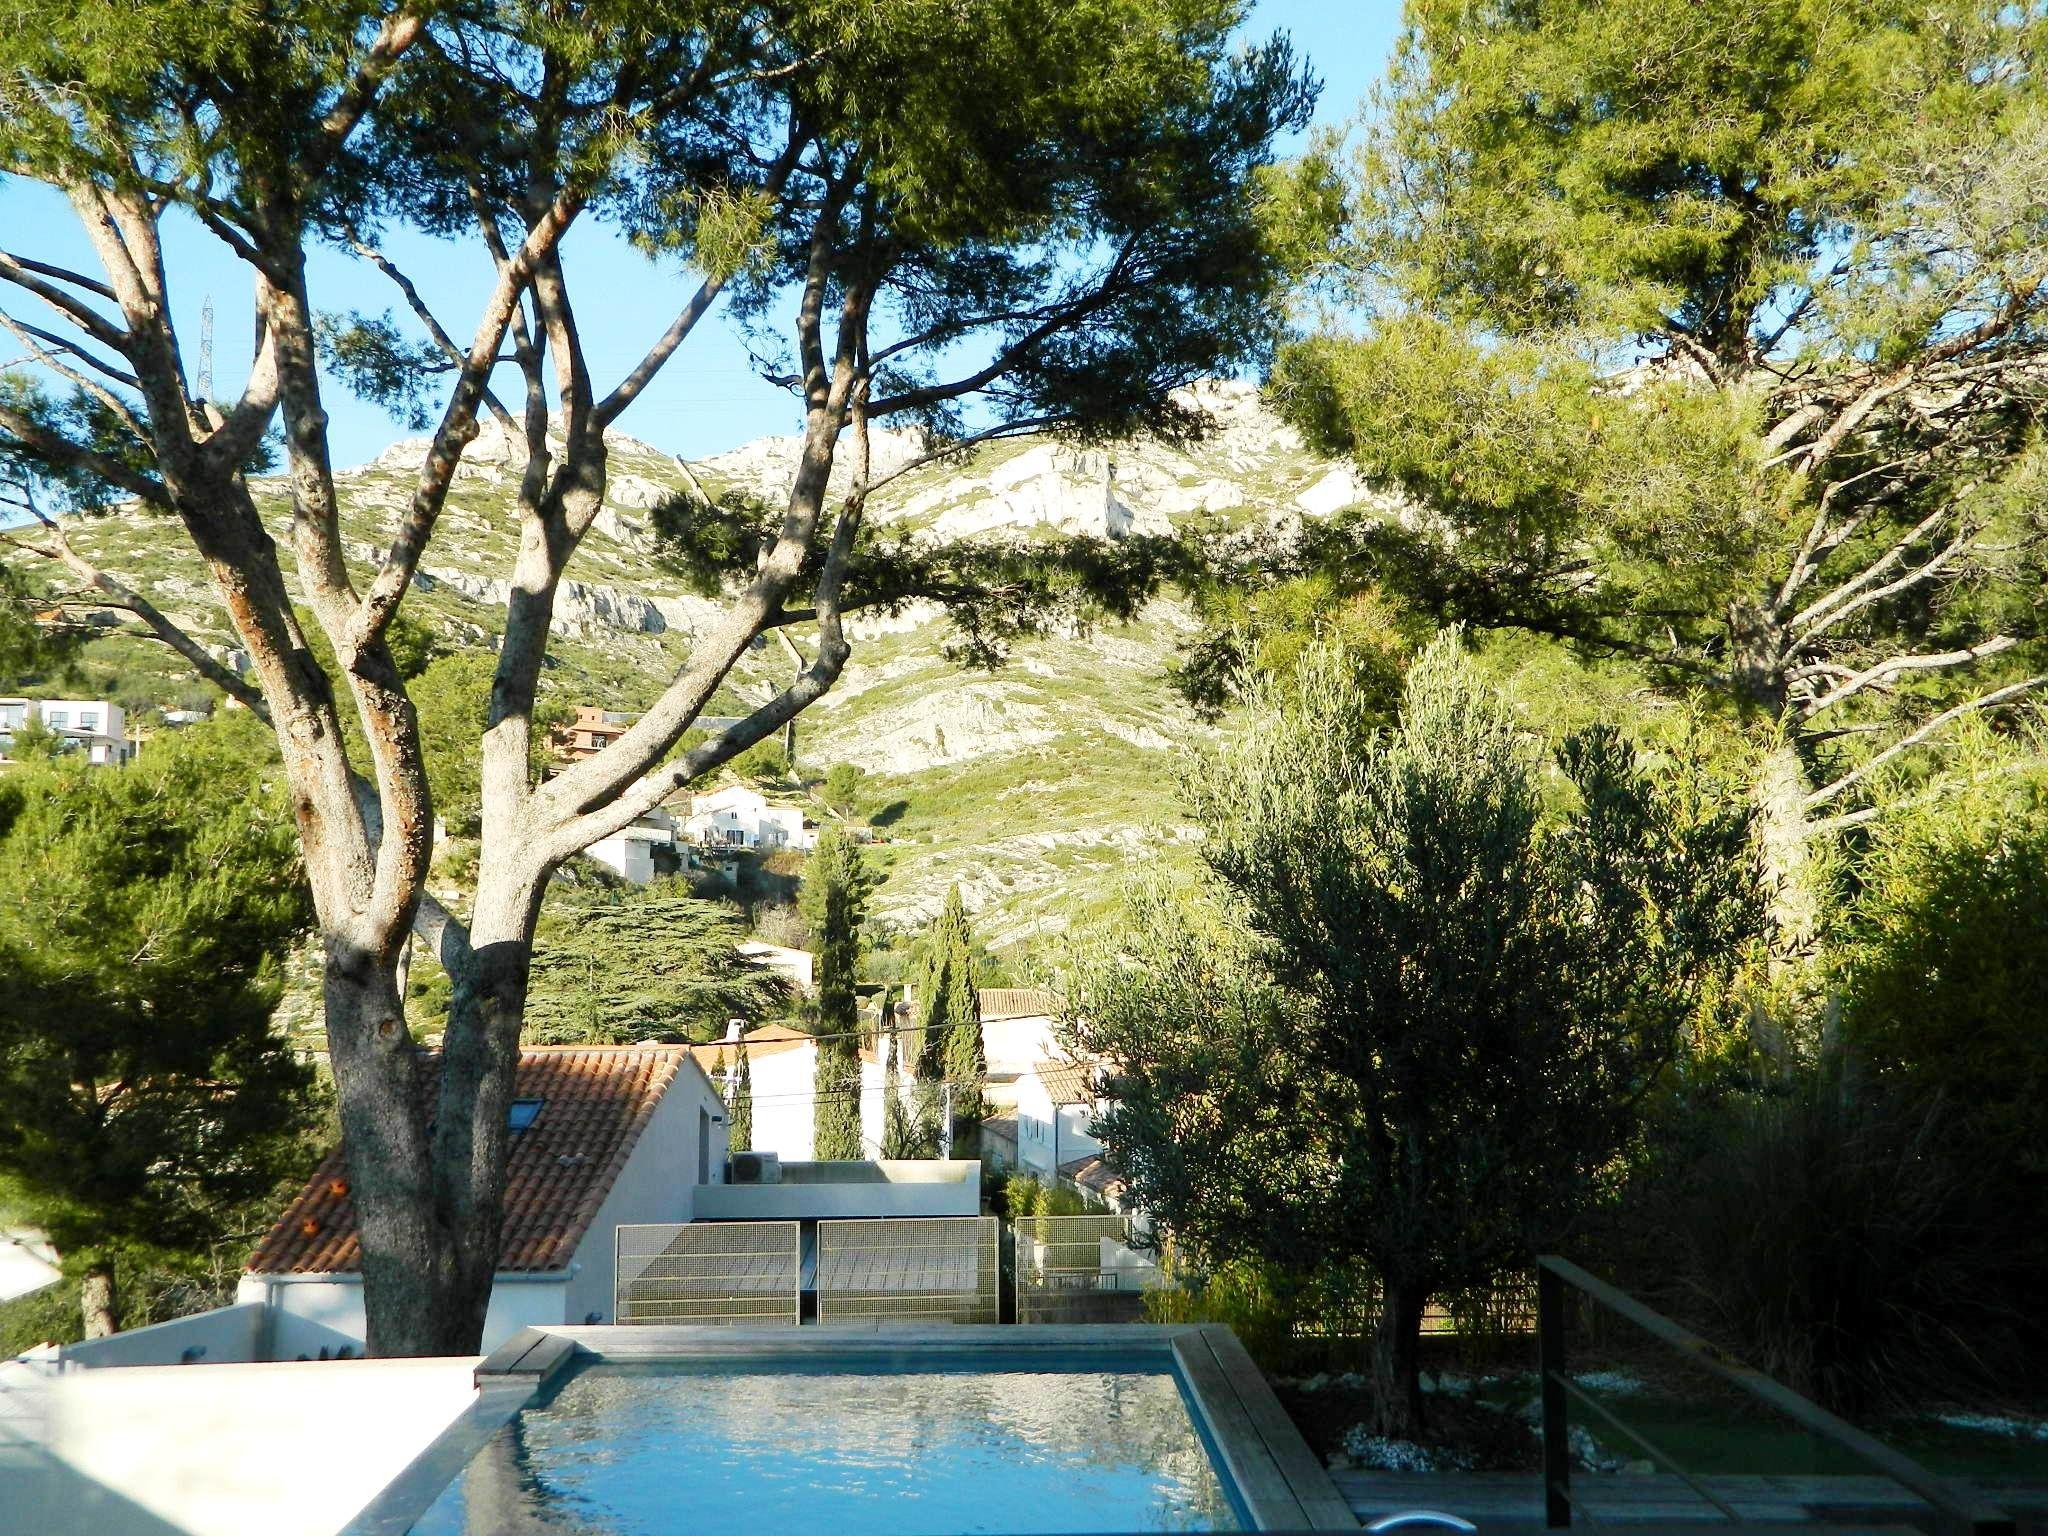 Nhà ở một gia đình vì Bán tại MARSEILLE - LA PANOUSE - EXCLUSIVITE Marseille, Provence-Alpes-Cote D'Azur, 13009 Pháp